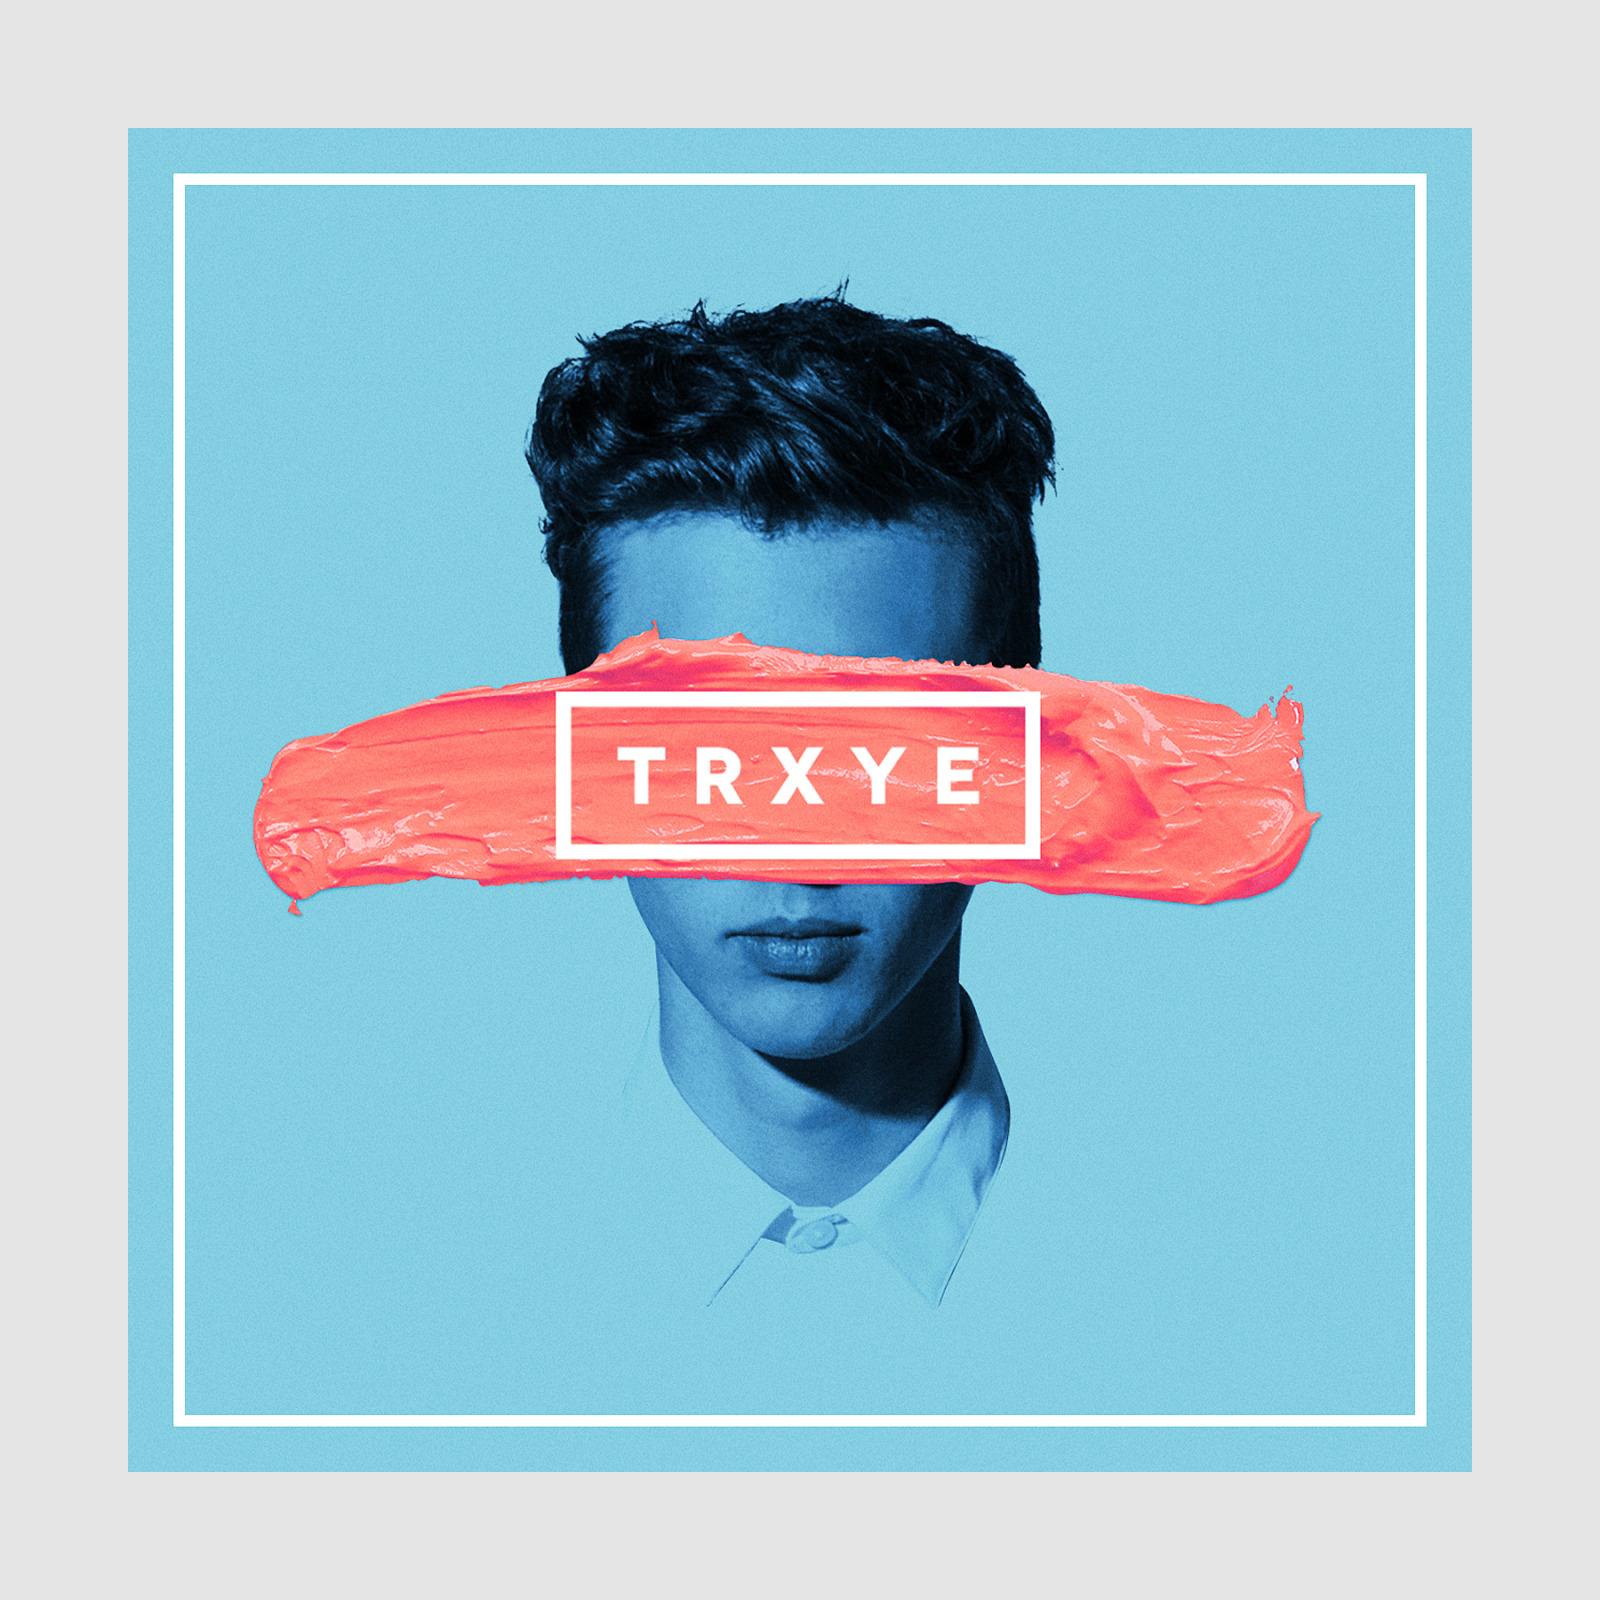 troye_01